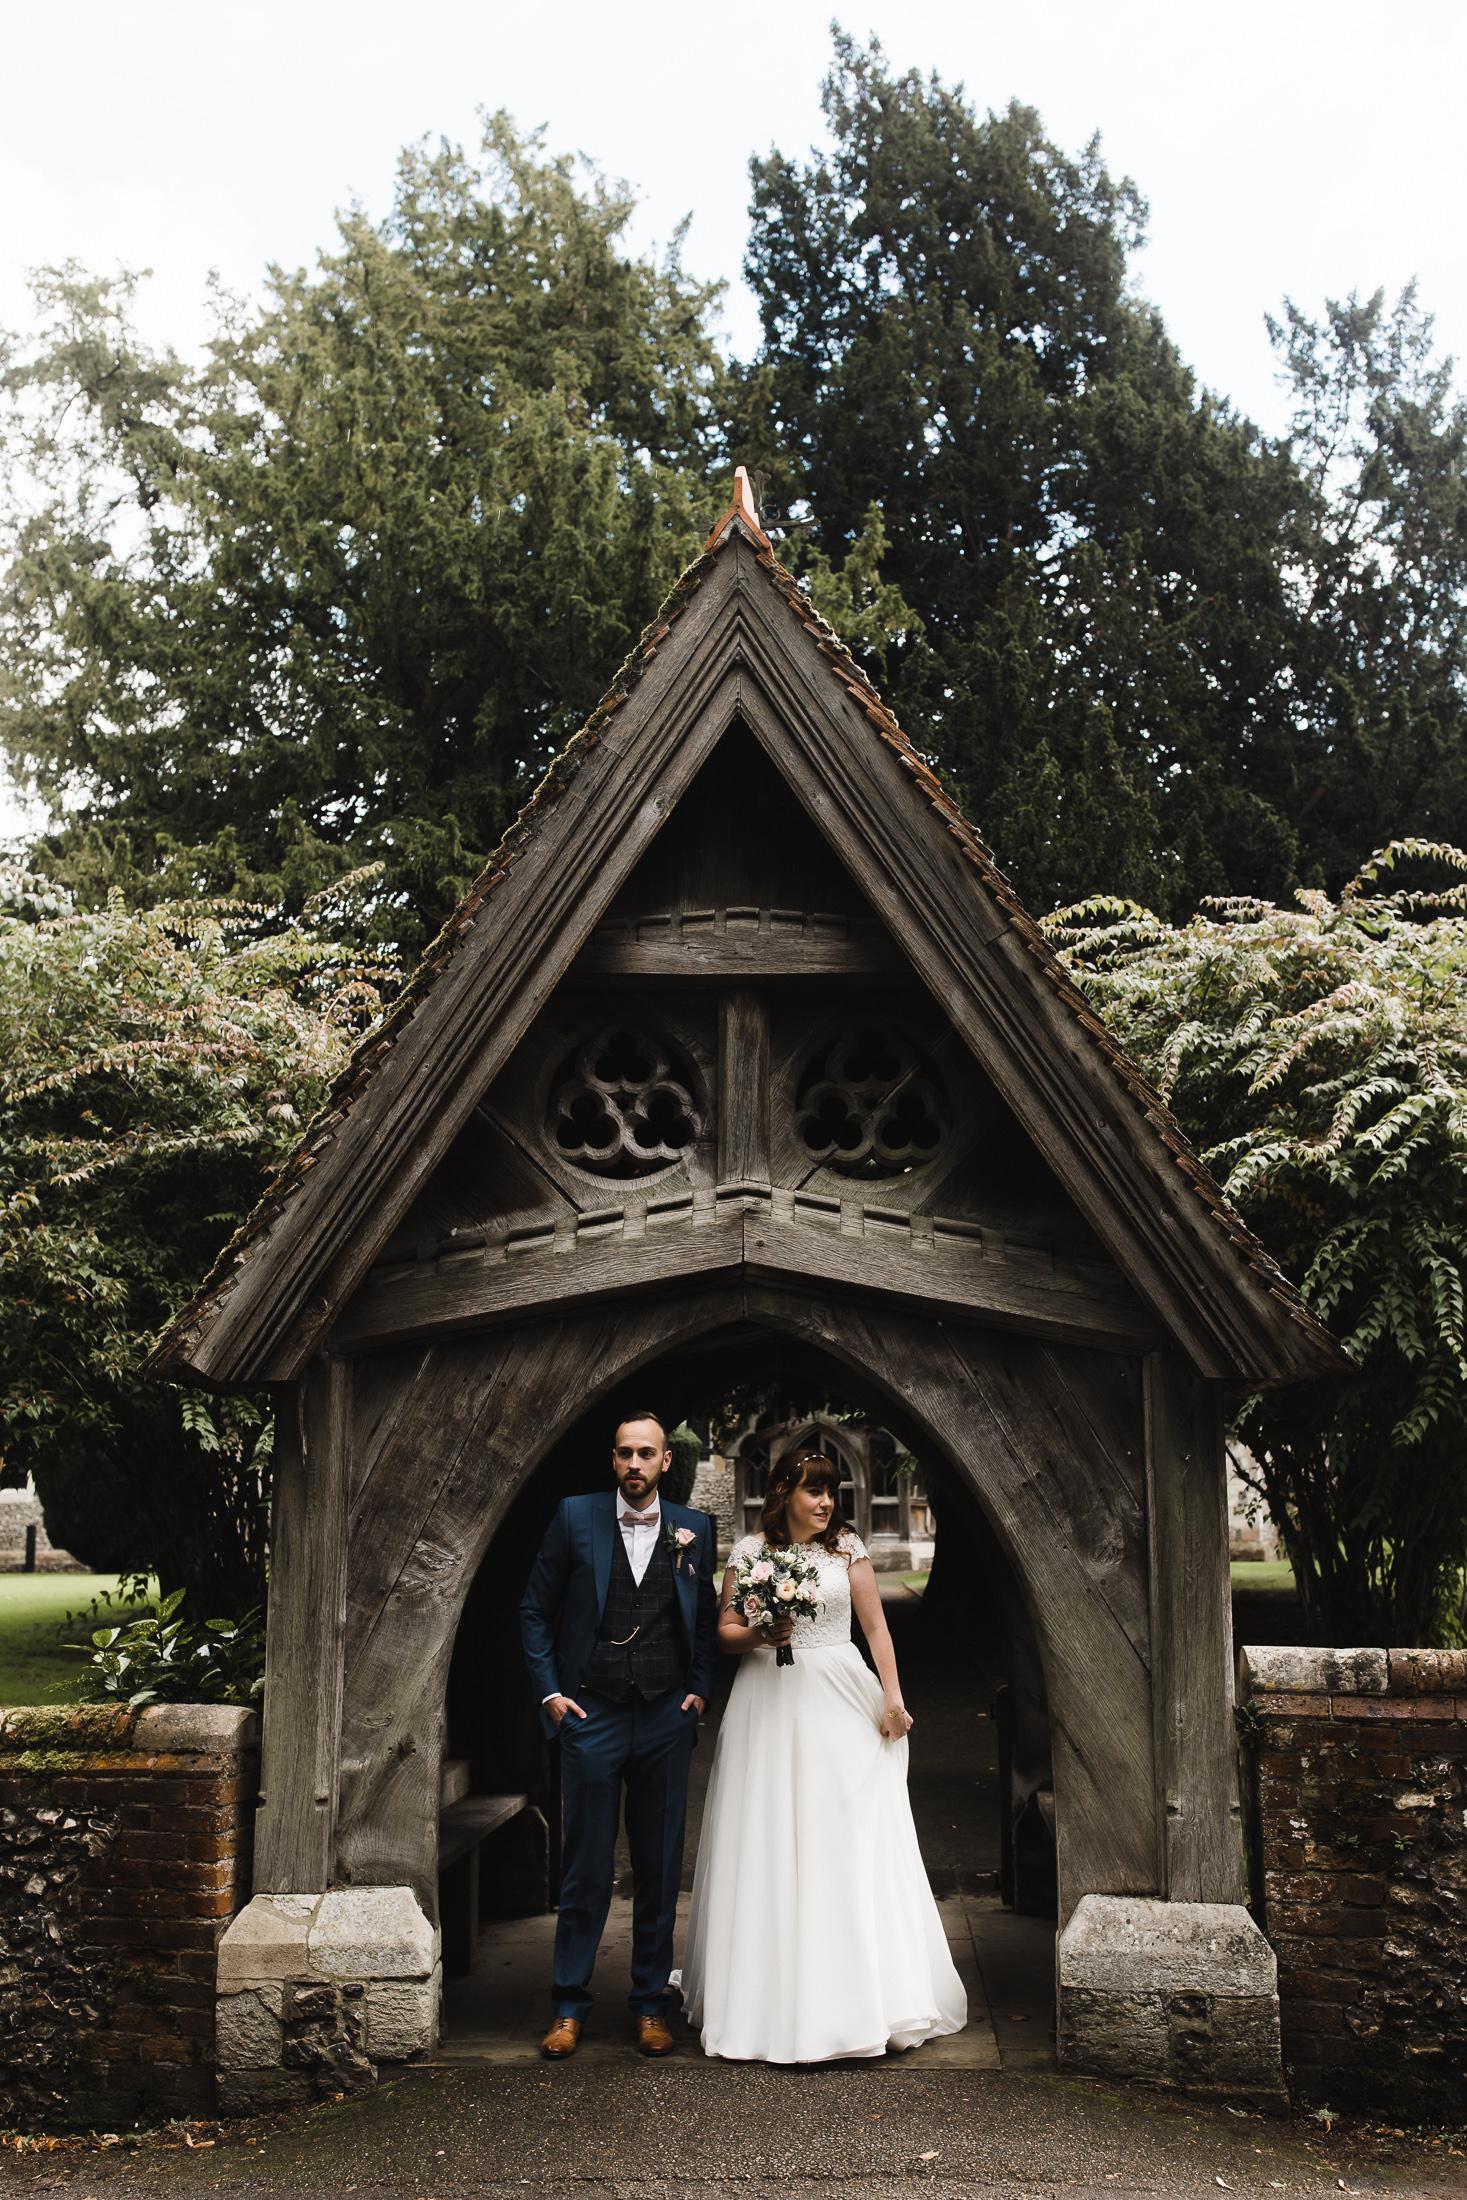 Nether_Wichendon_House_Wedding_029.jpg